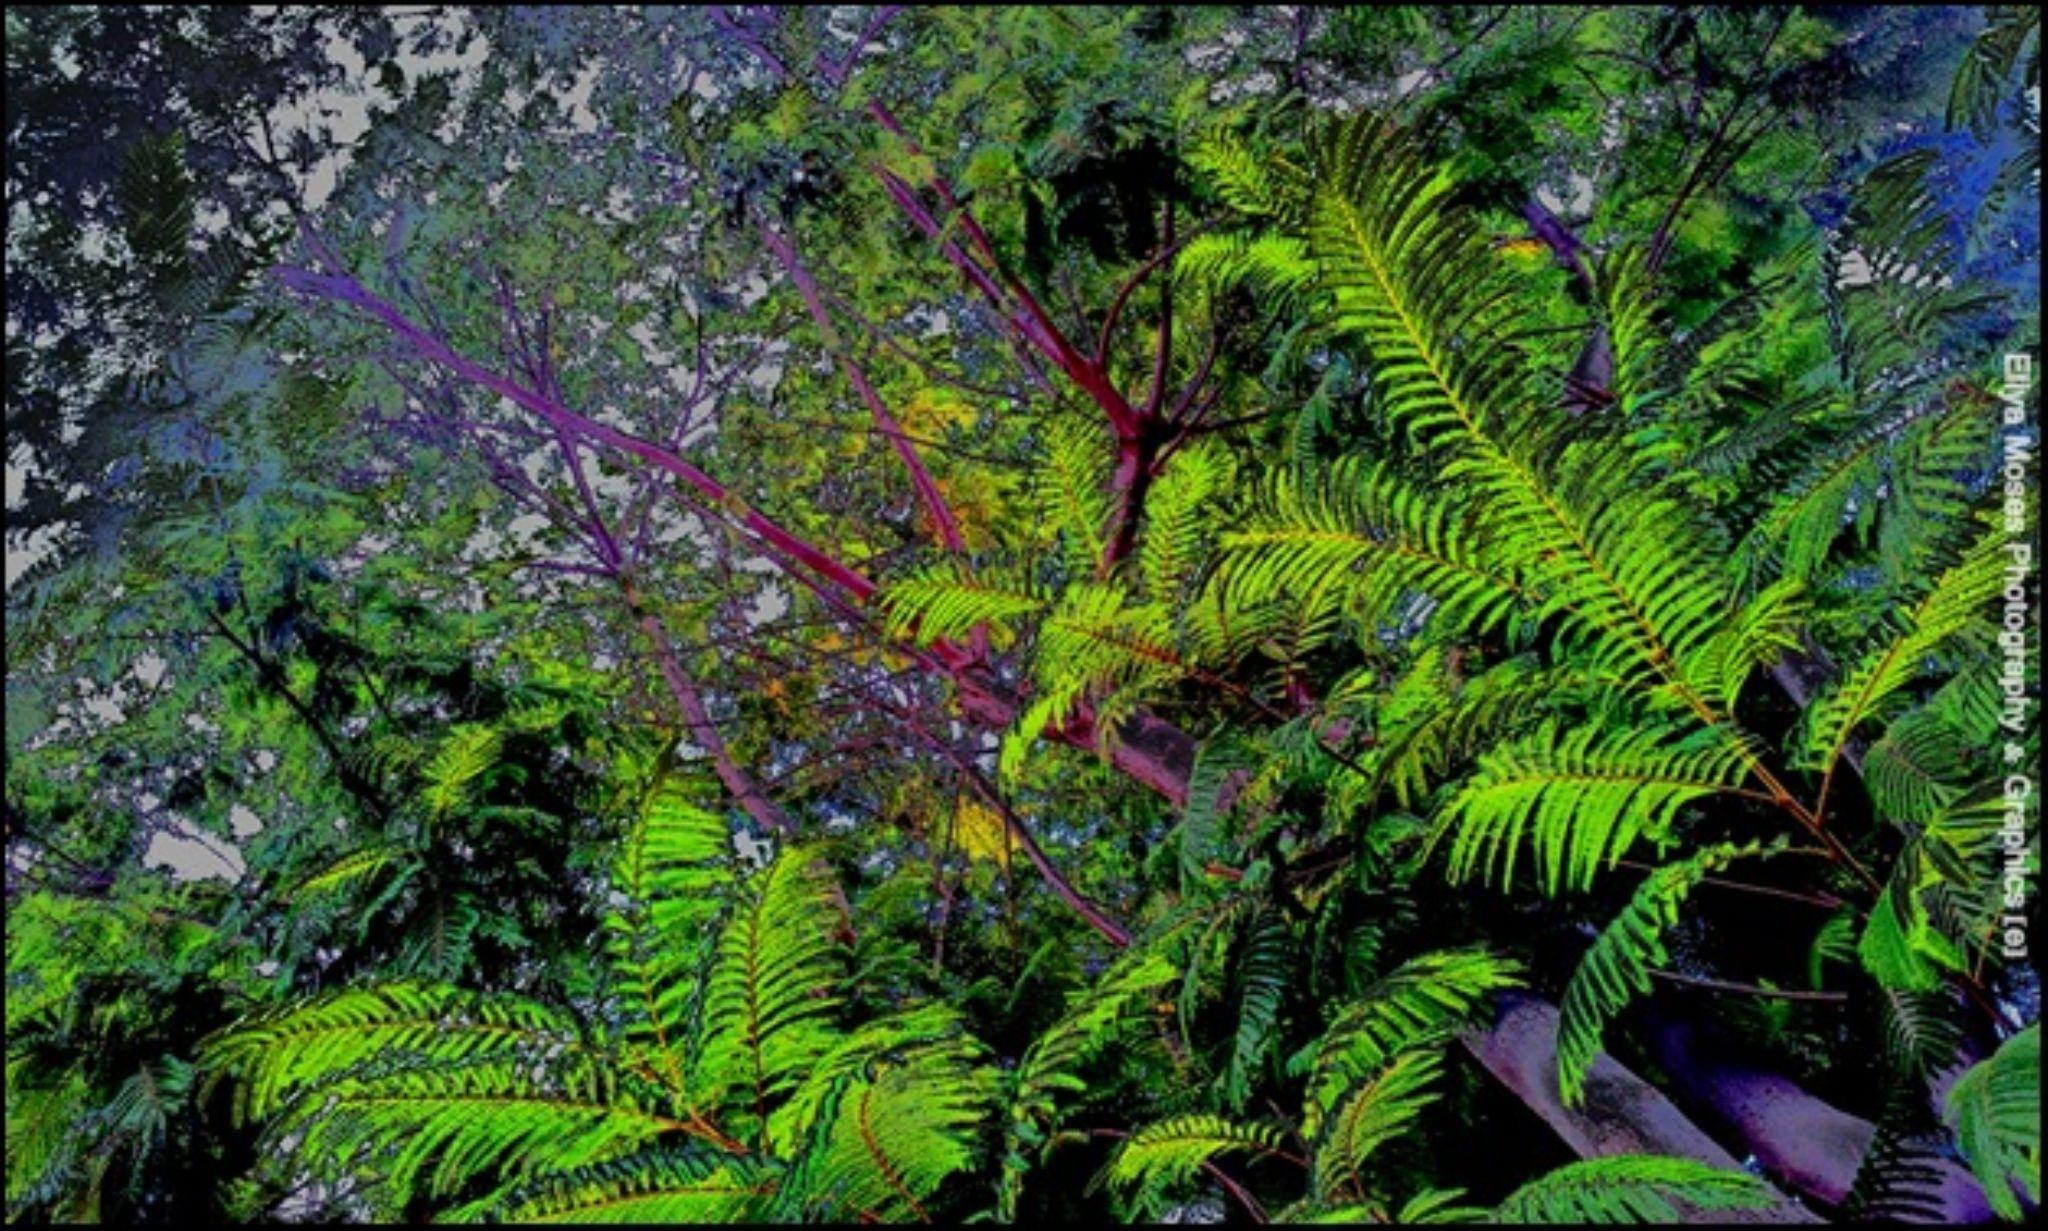 Jungle Feaver  by Eliya.M. Moses